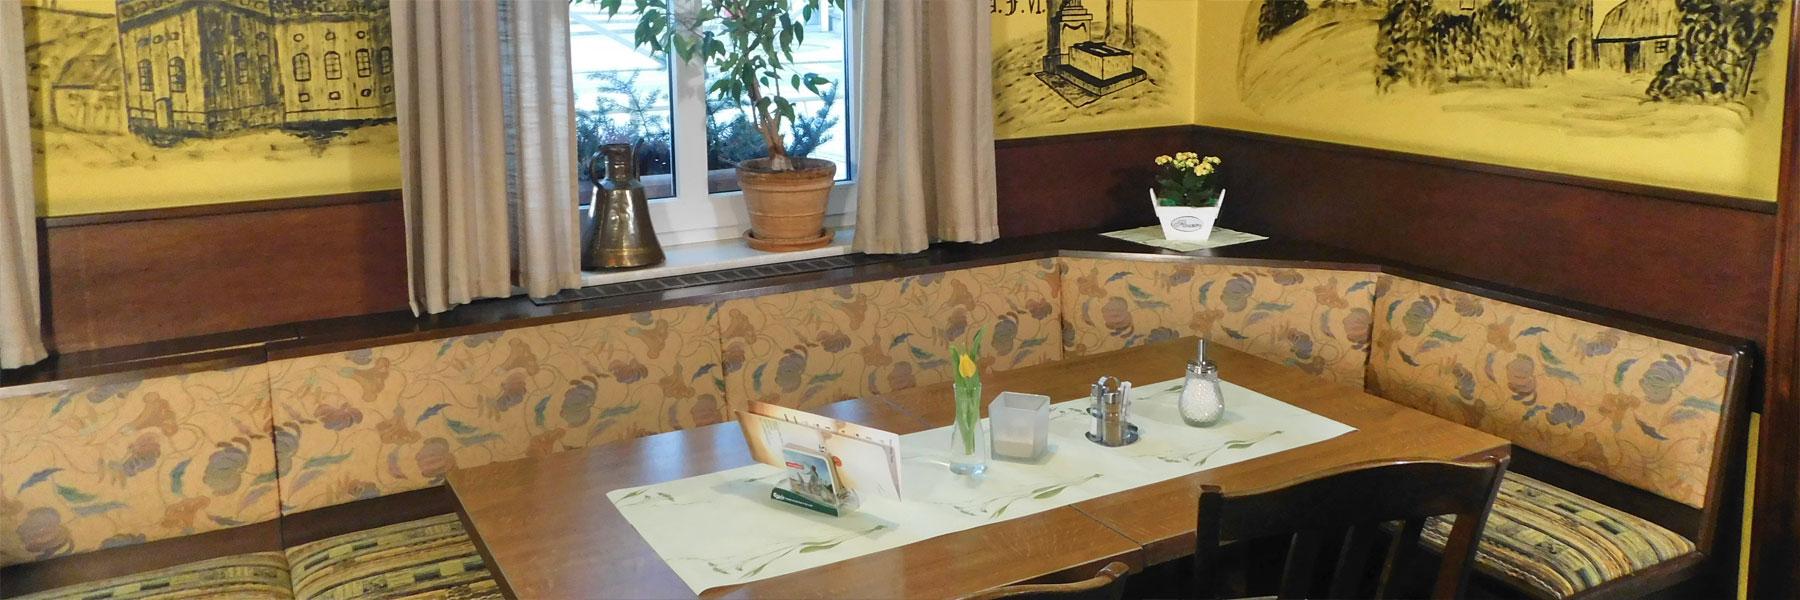 Restaurant - Mecklenburger Hof